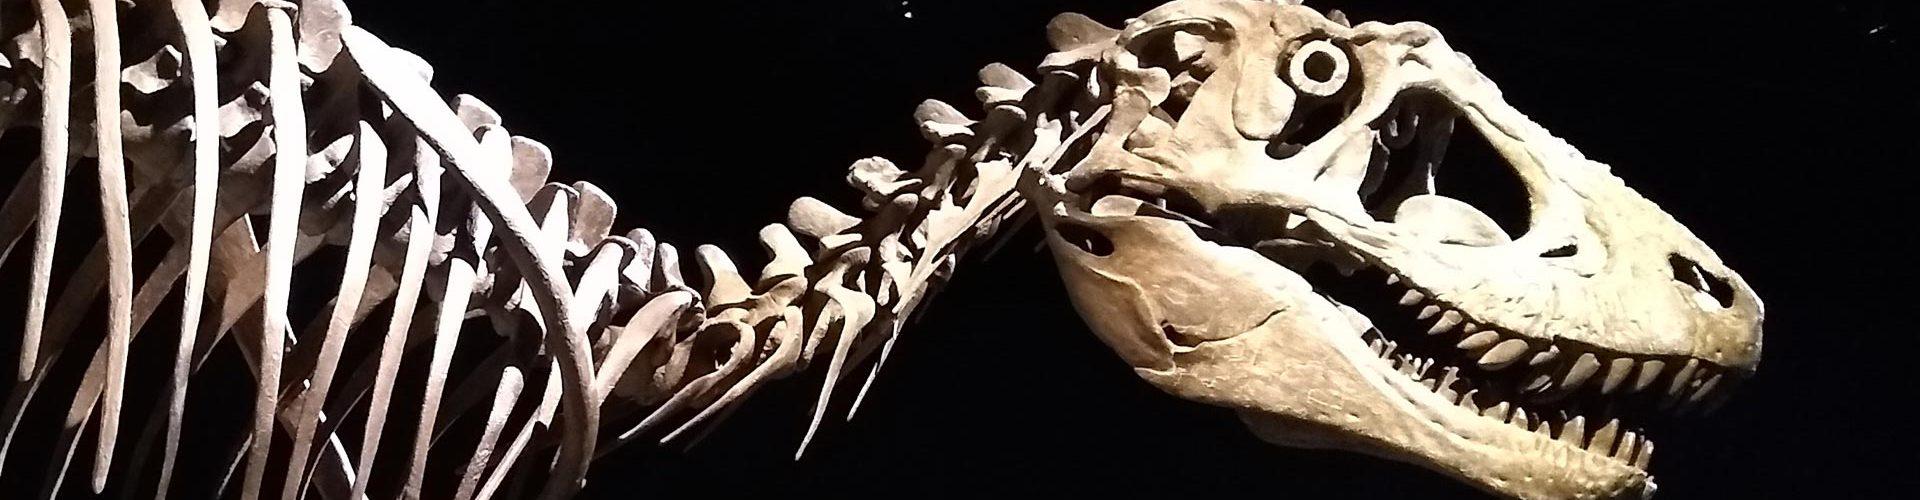 Cast skeleton of a dinosaur